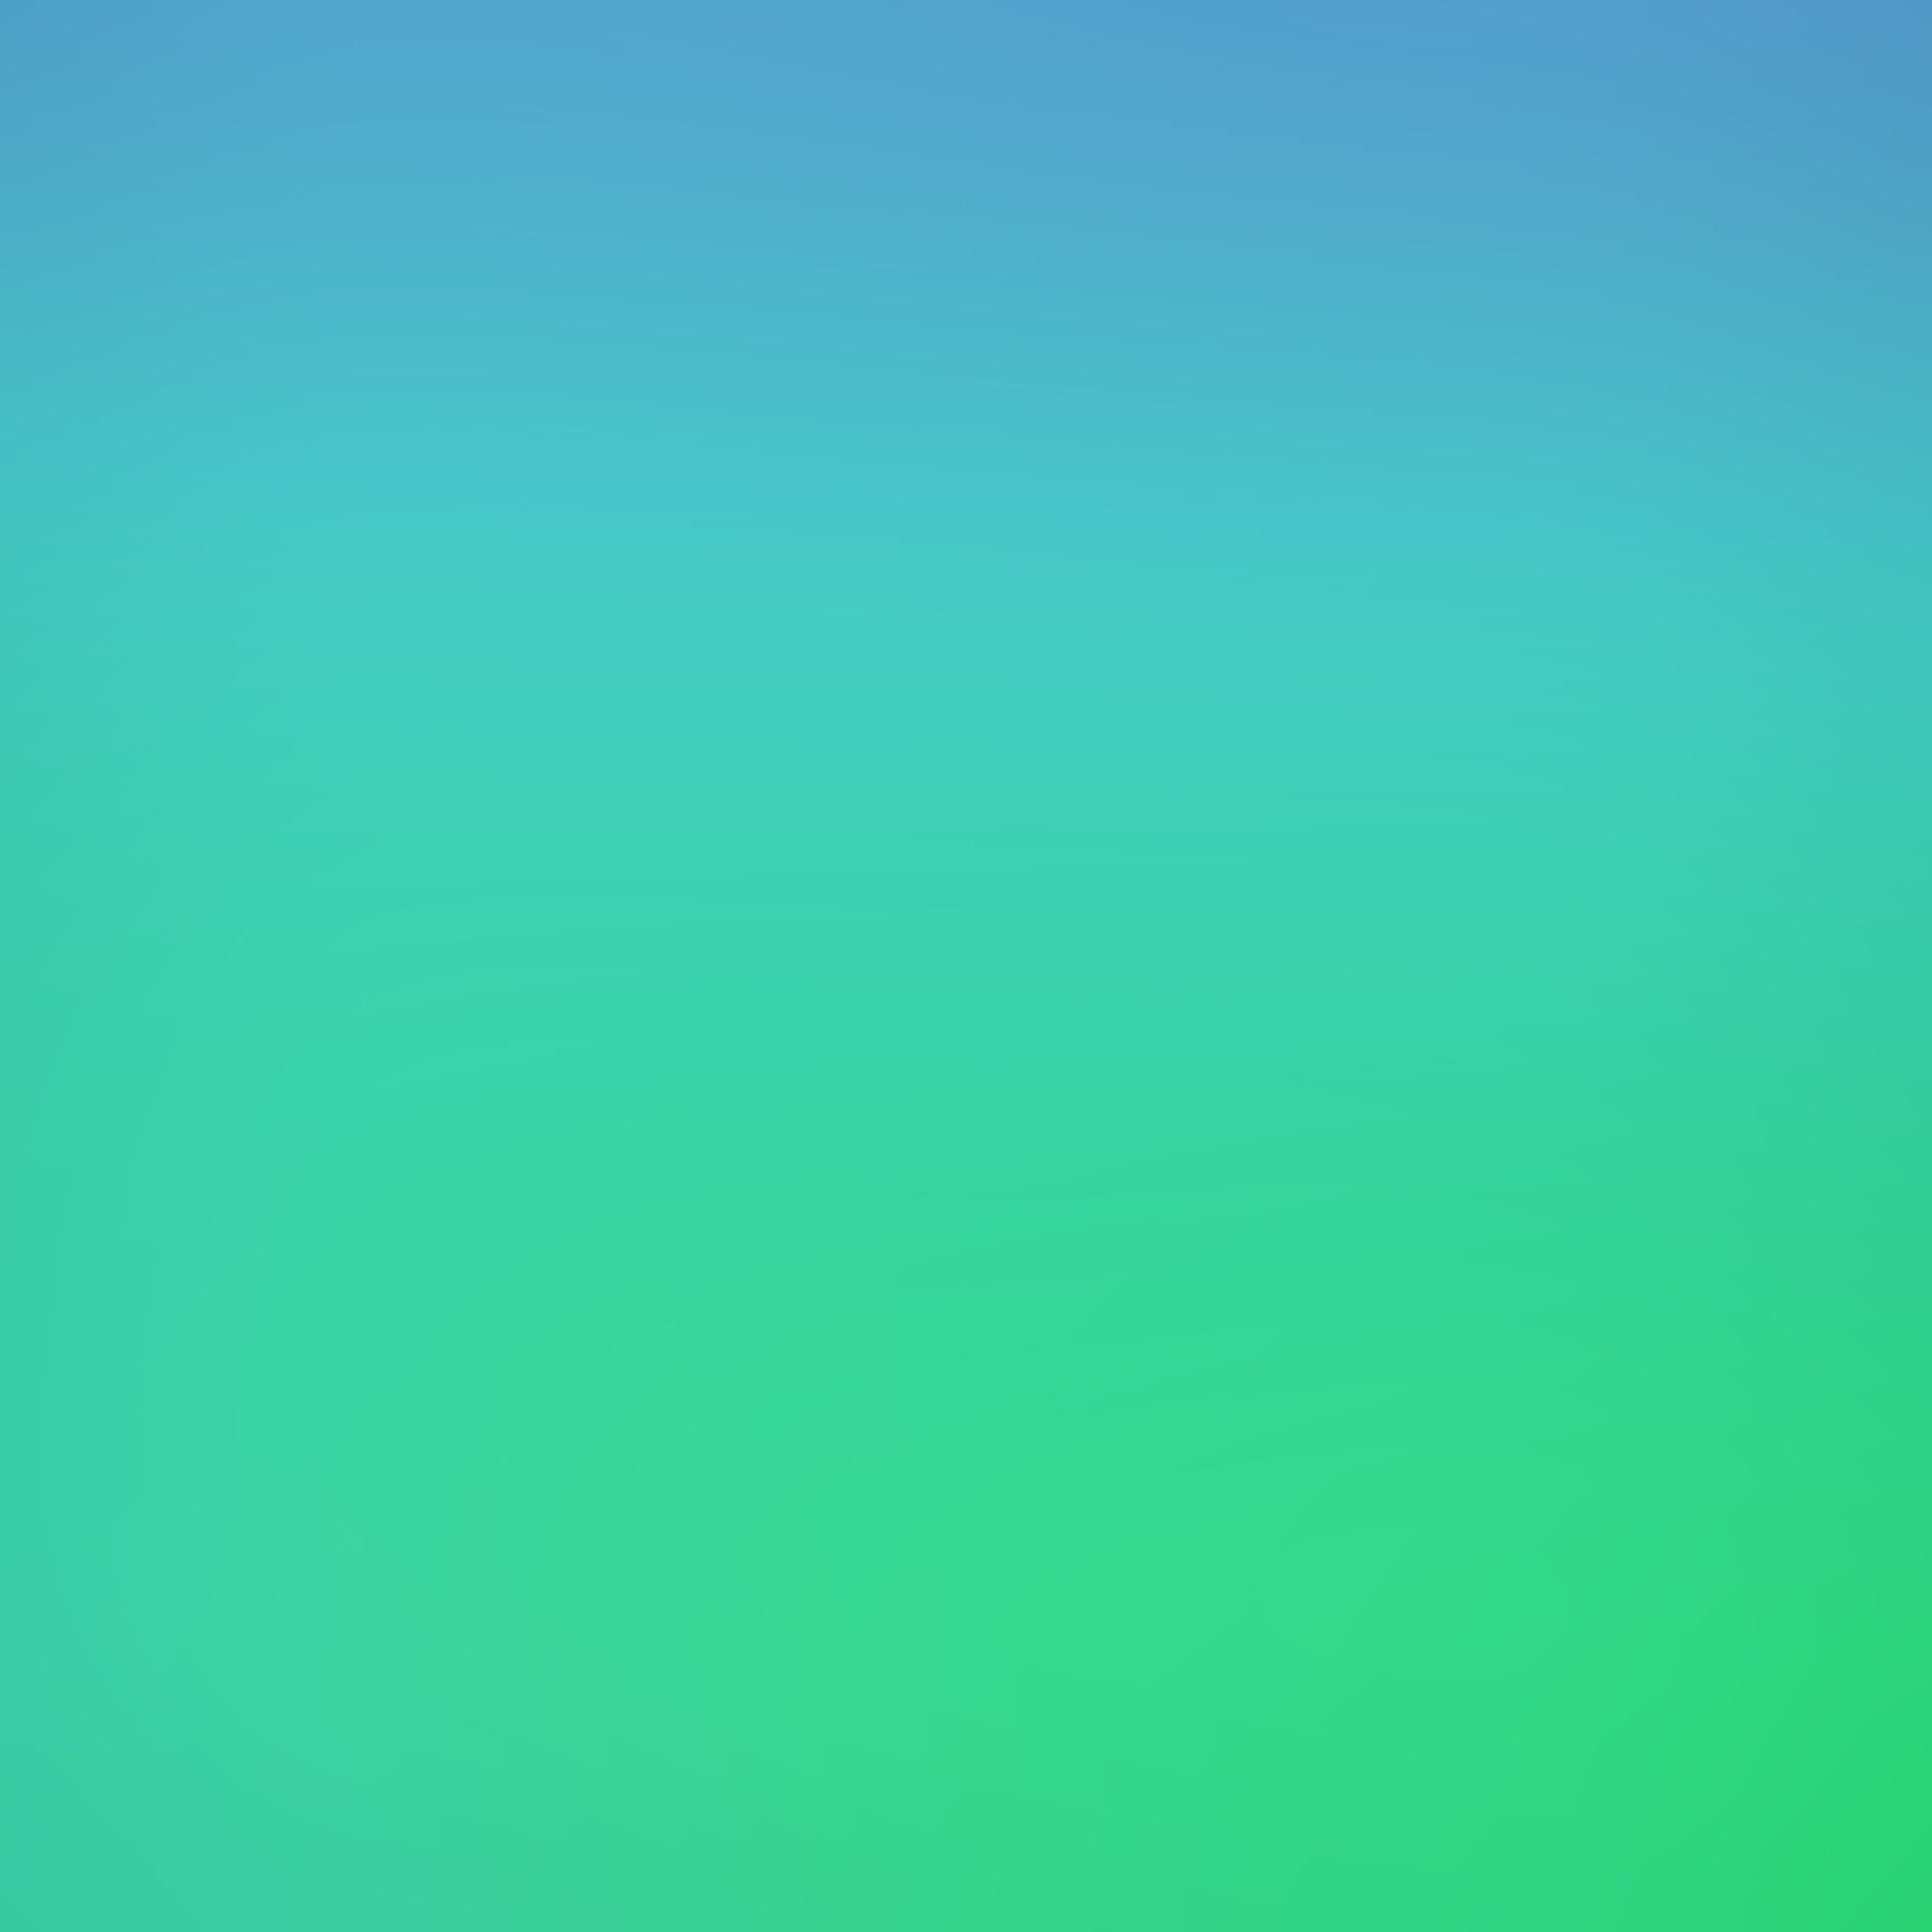 Blue Green Purple Galaxy Bedding: Si47-blue-green-neon-gradation-blur